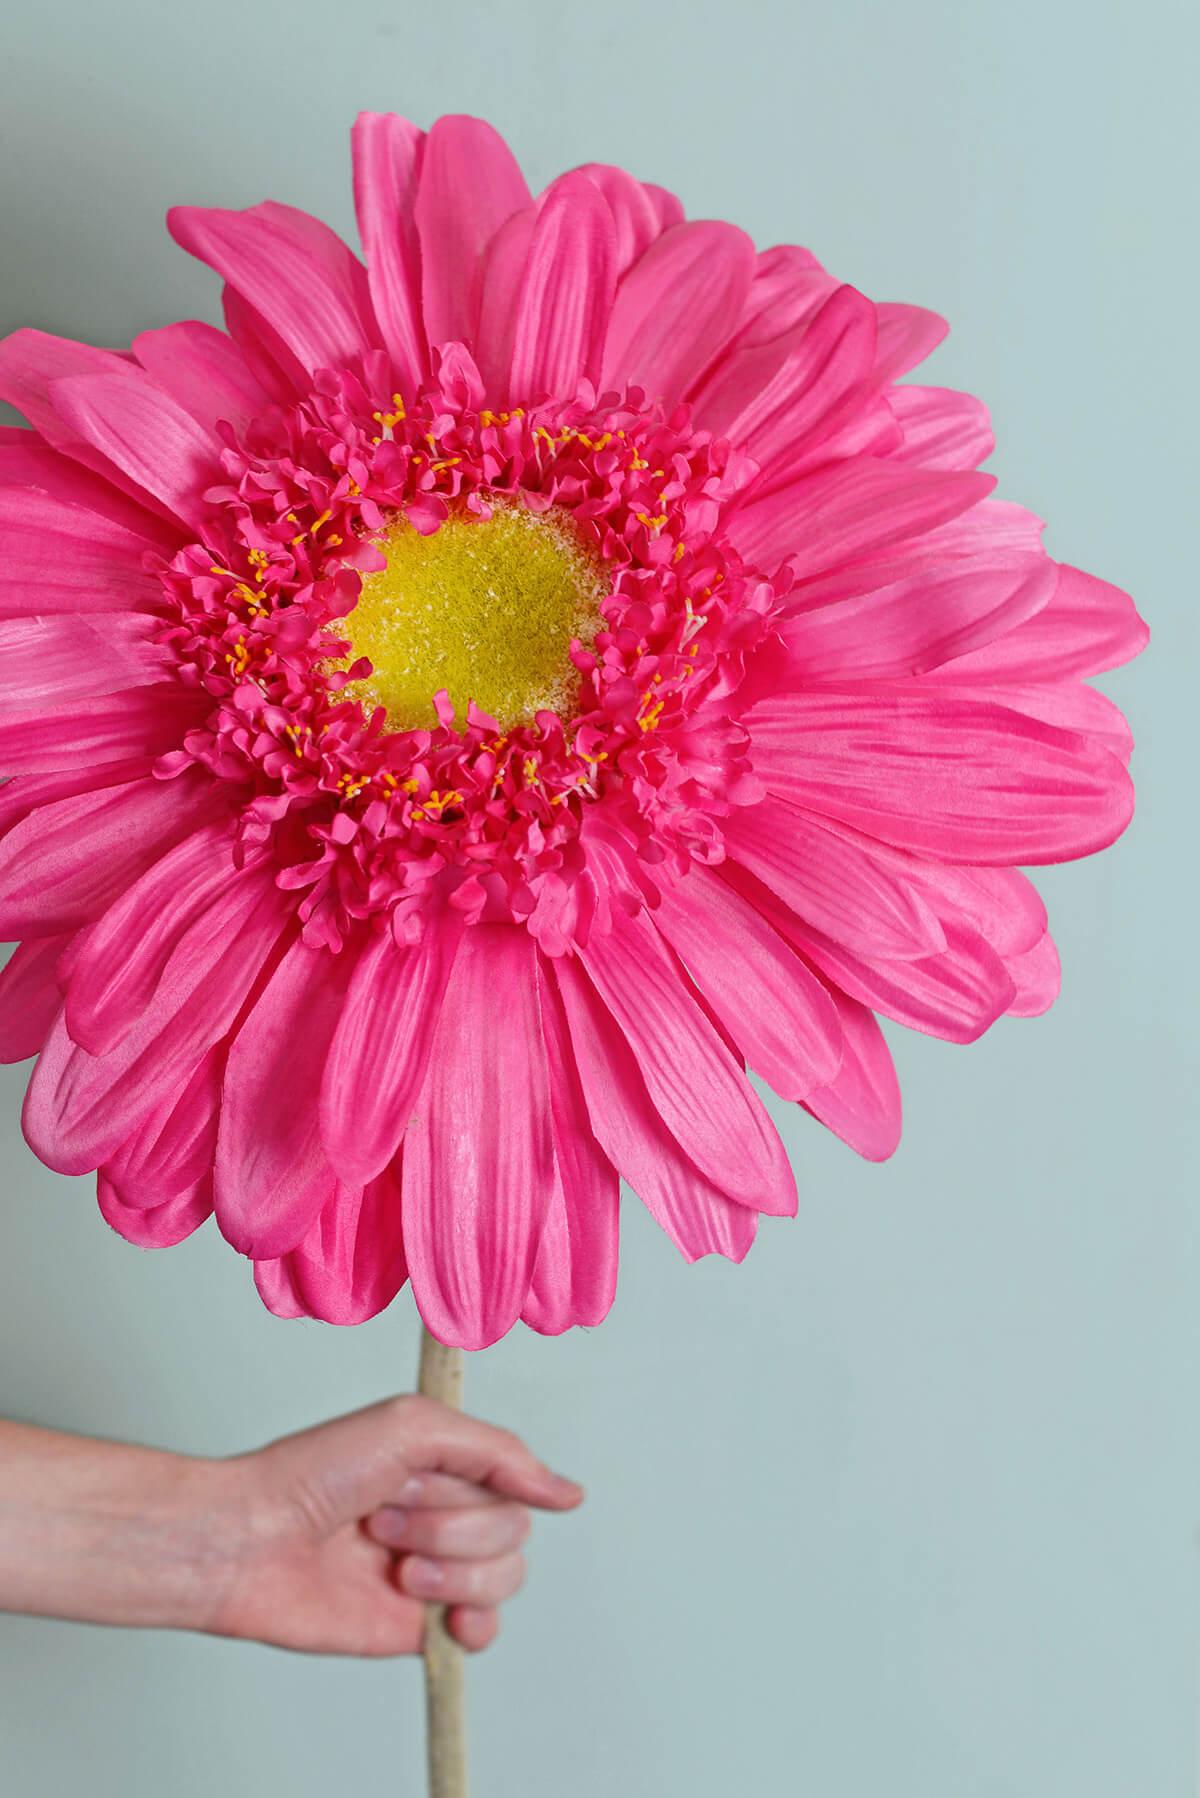 34 Silk Jumbo Ruffle Gerbera Daisy Flower Spray Cerise Pink